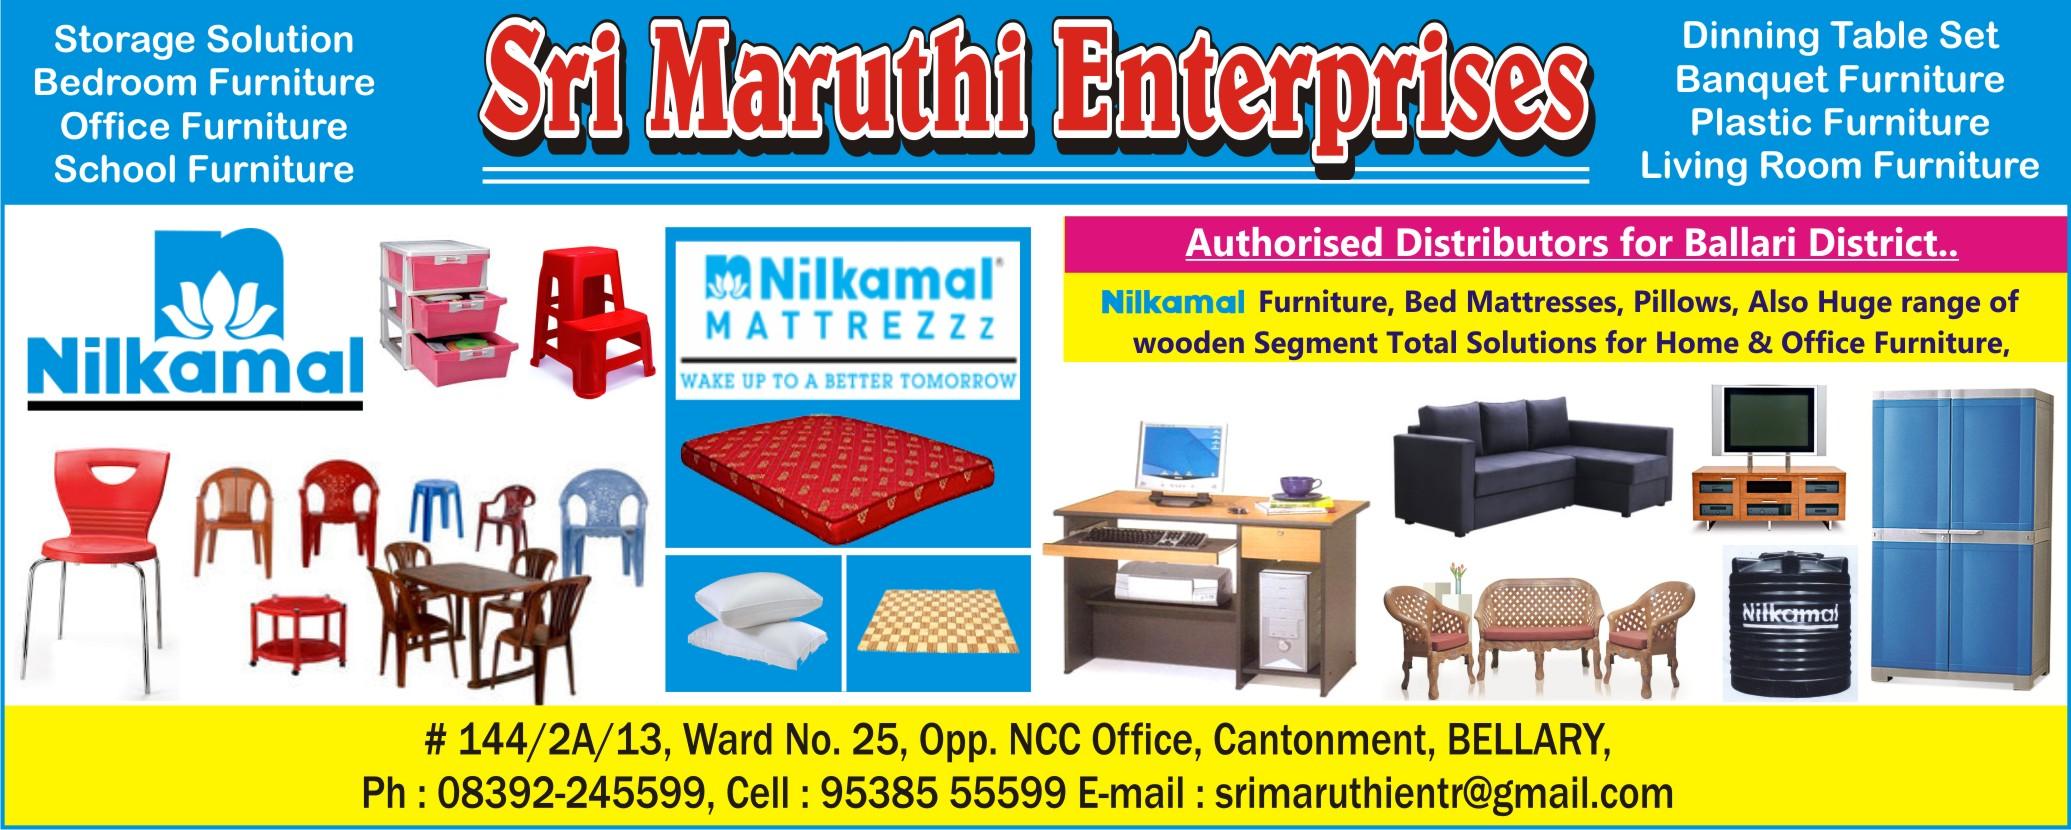 Sri Maruthi Enterprises